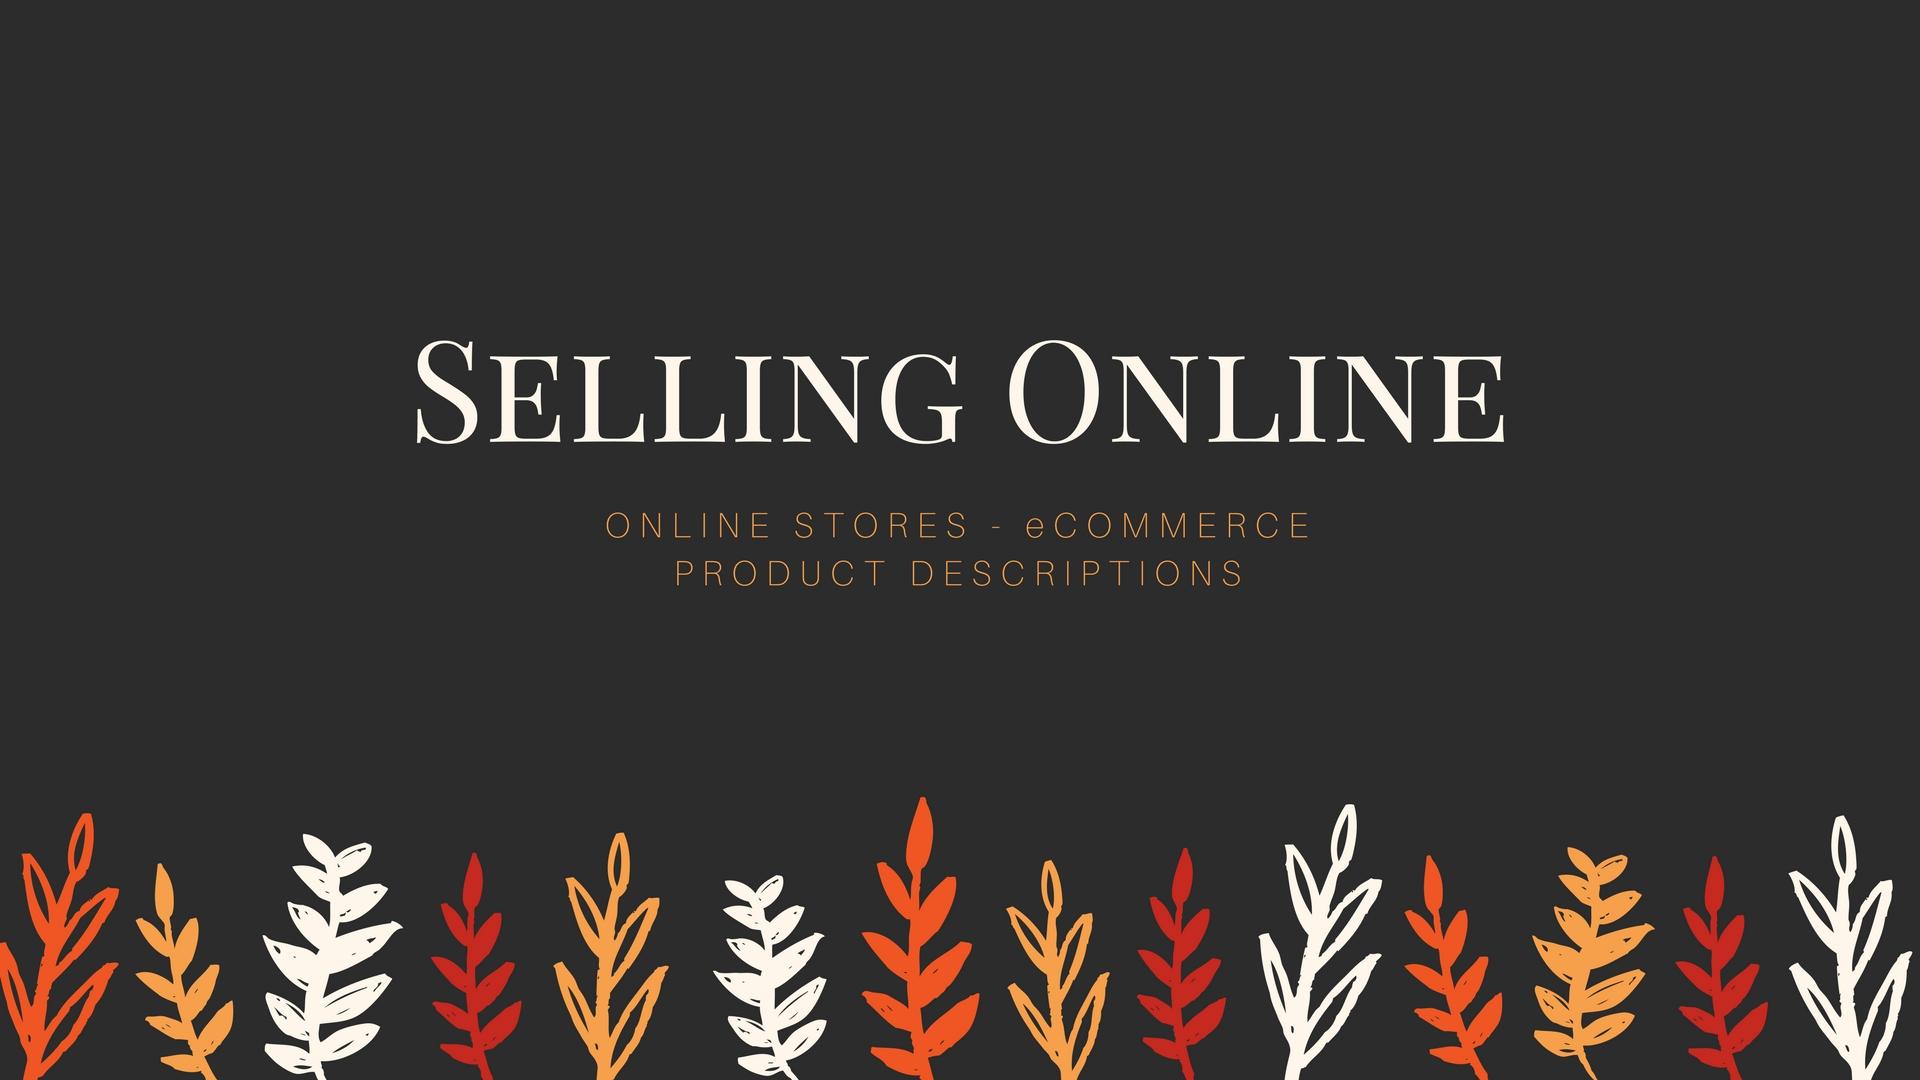 Copywriter Melinda J. Irvine helps online retailers sell online